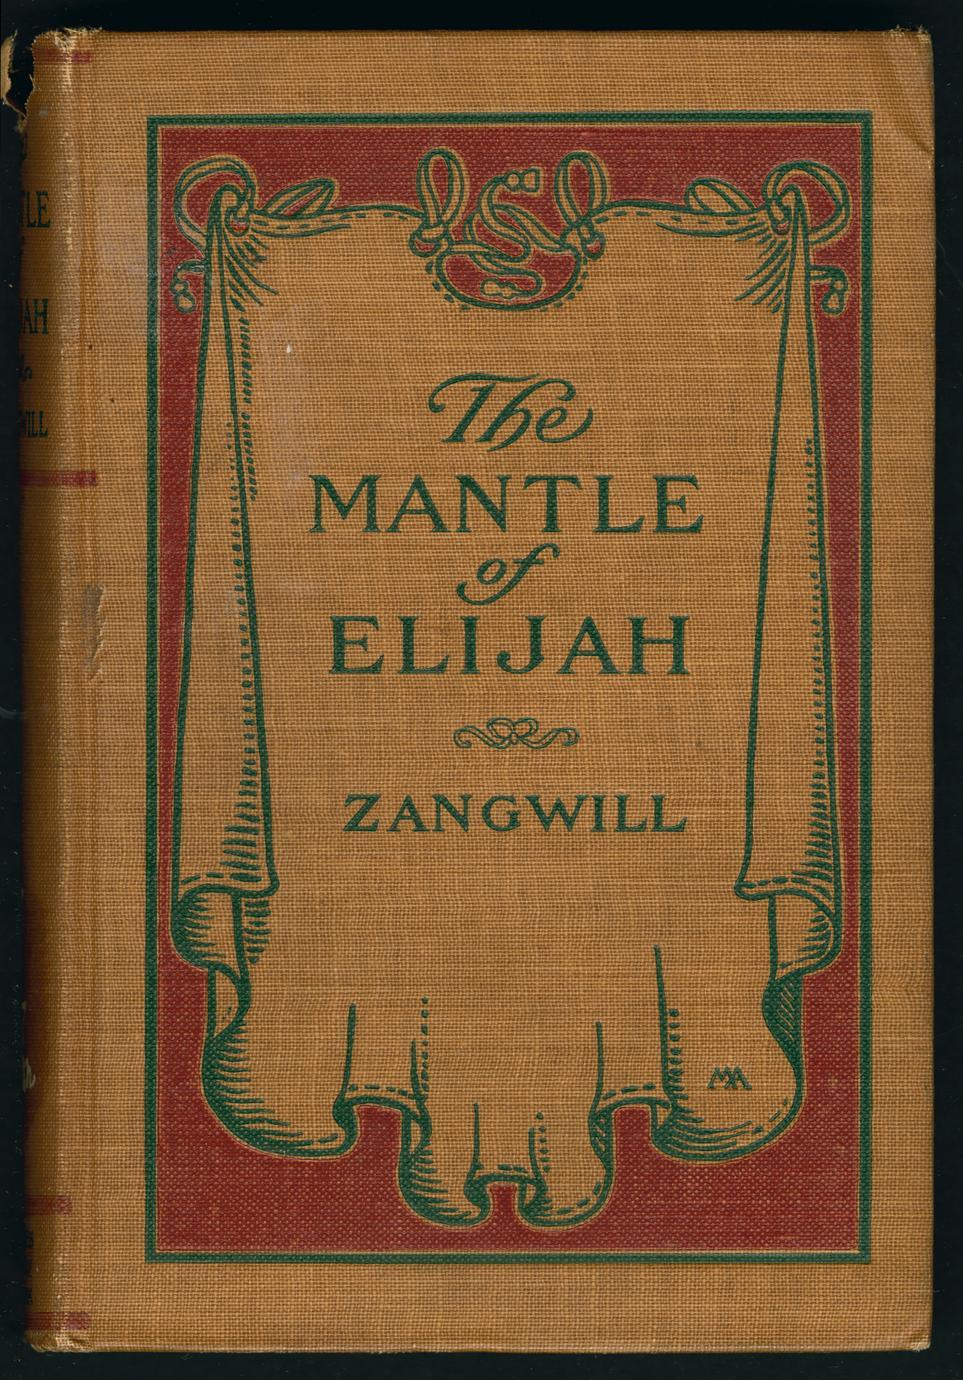 The mantle of Elijah (1 of 2)